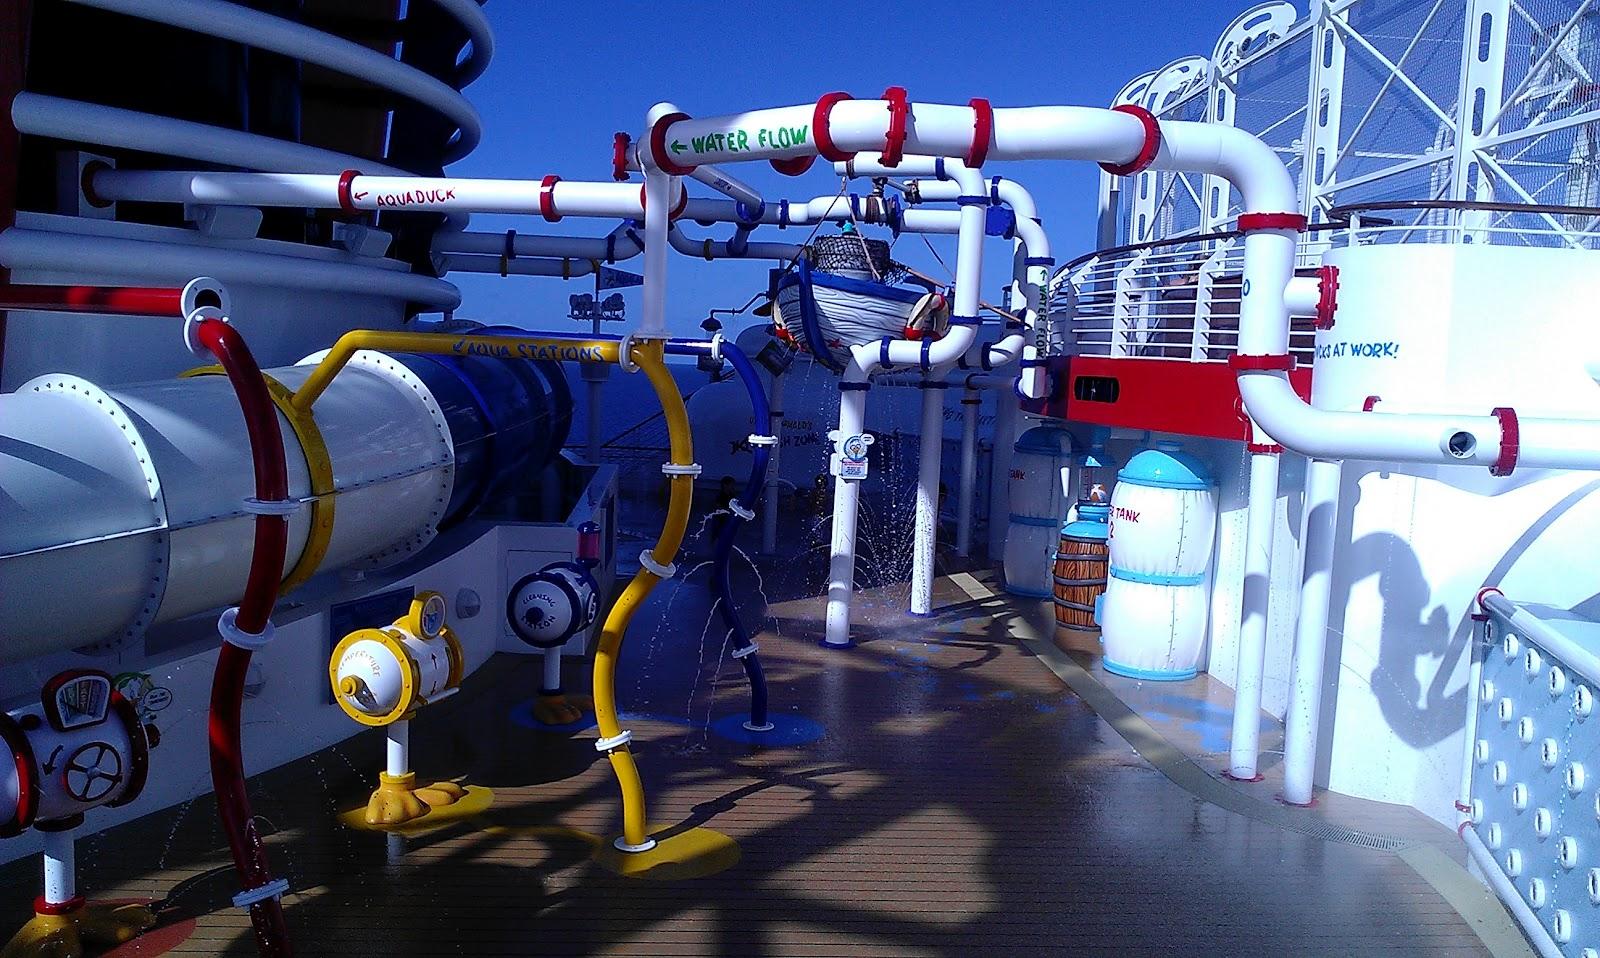 Aqua Lab Disney Fantasy Cruise ship